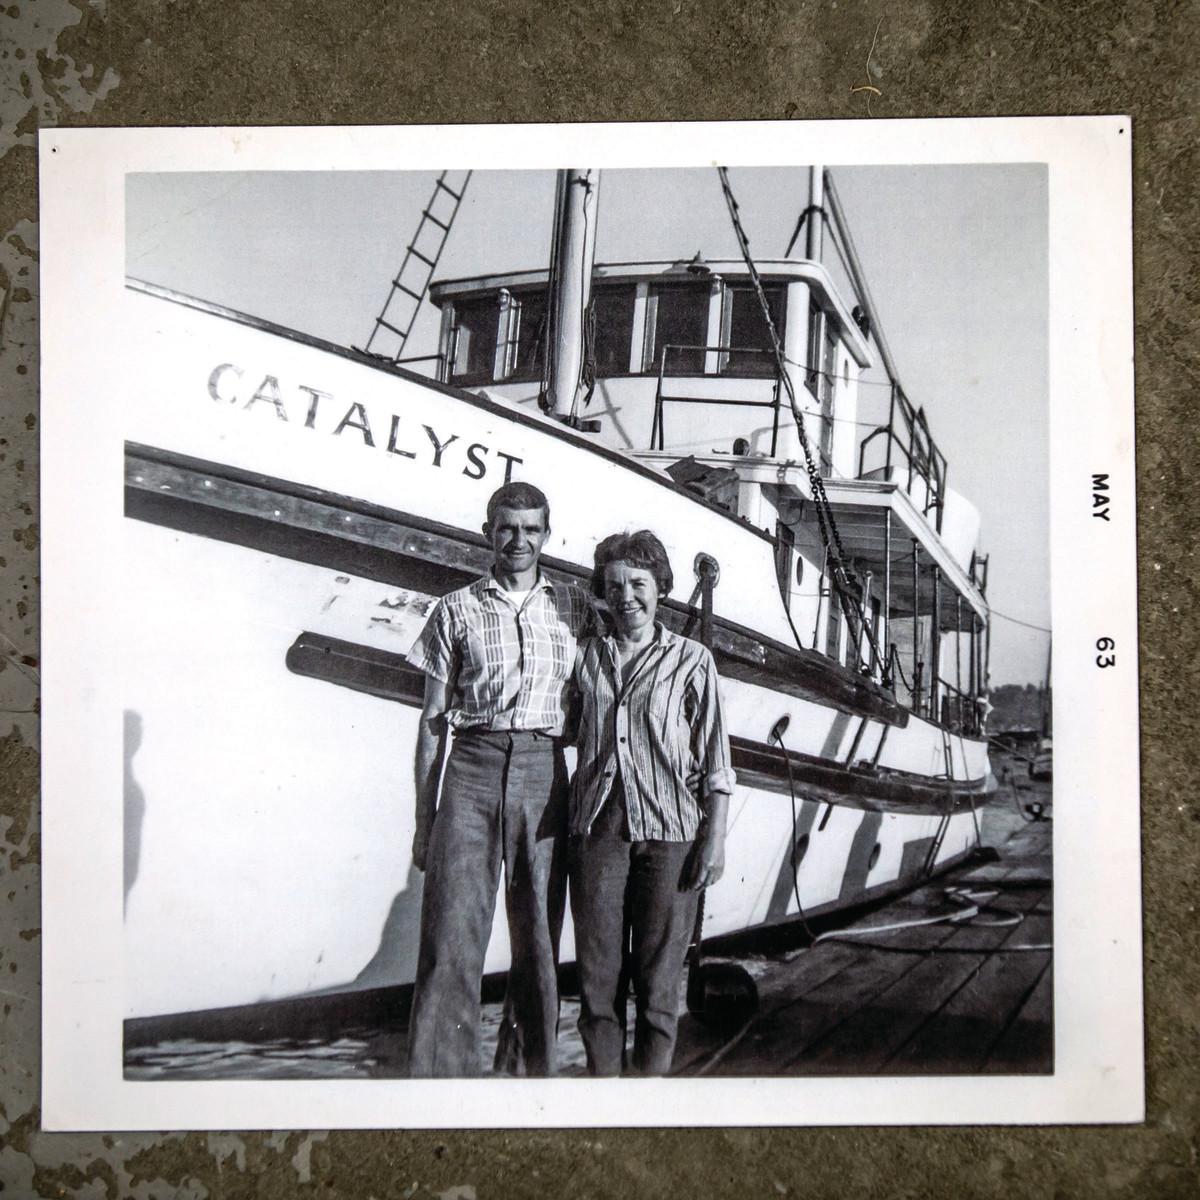 Pete's parents in front of Catalystin California.